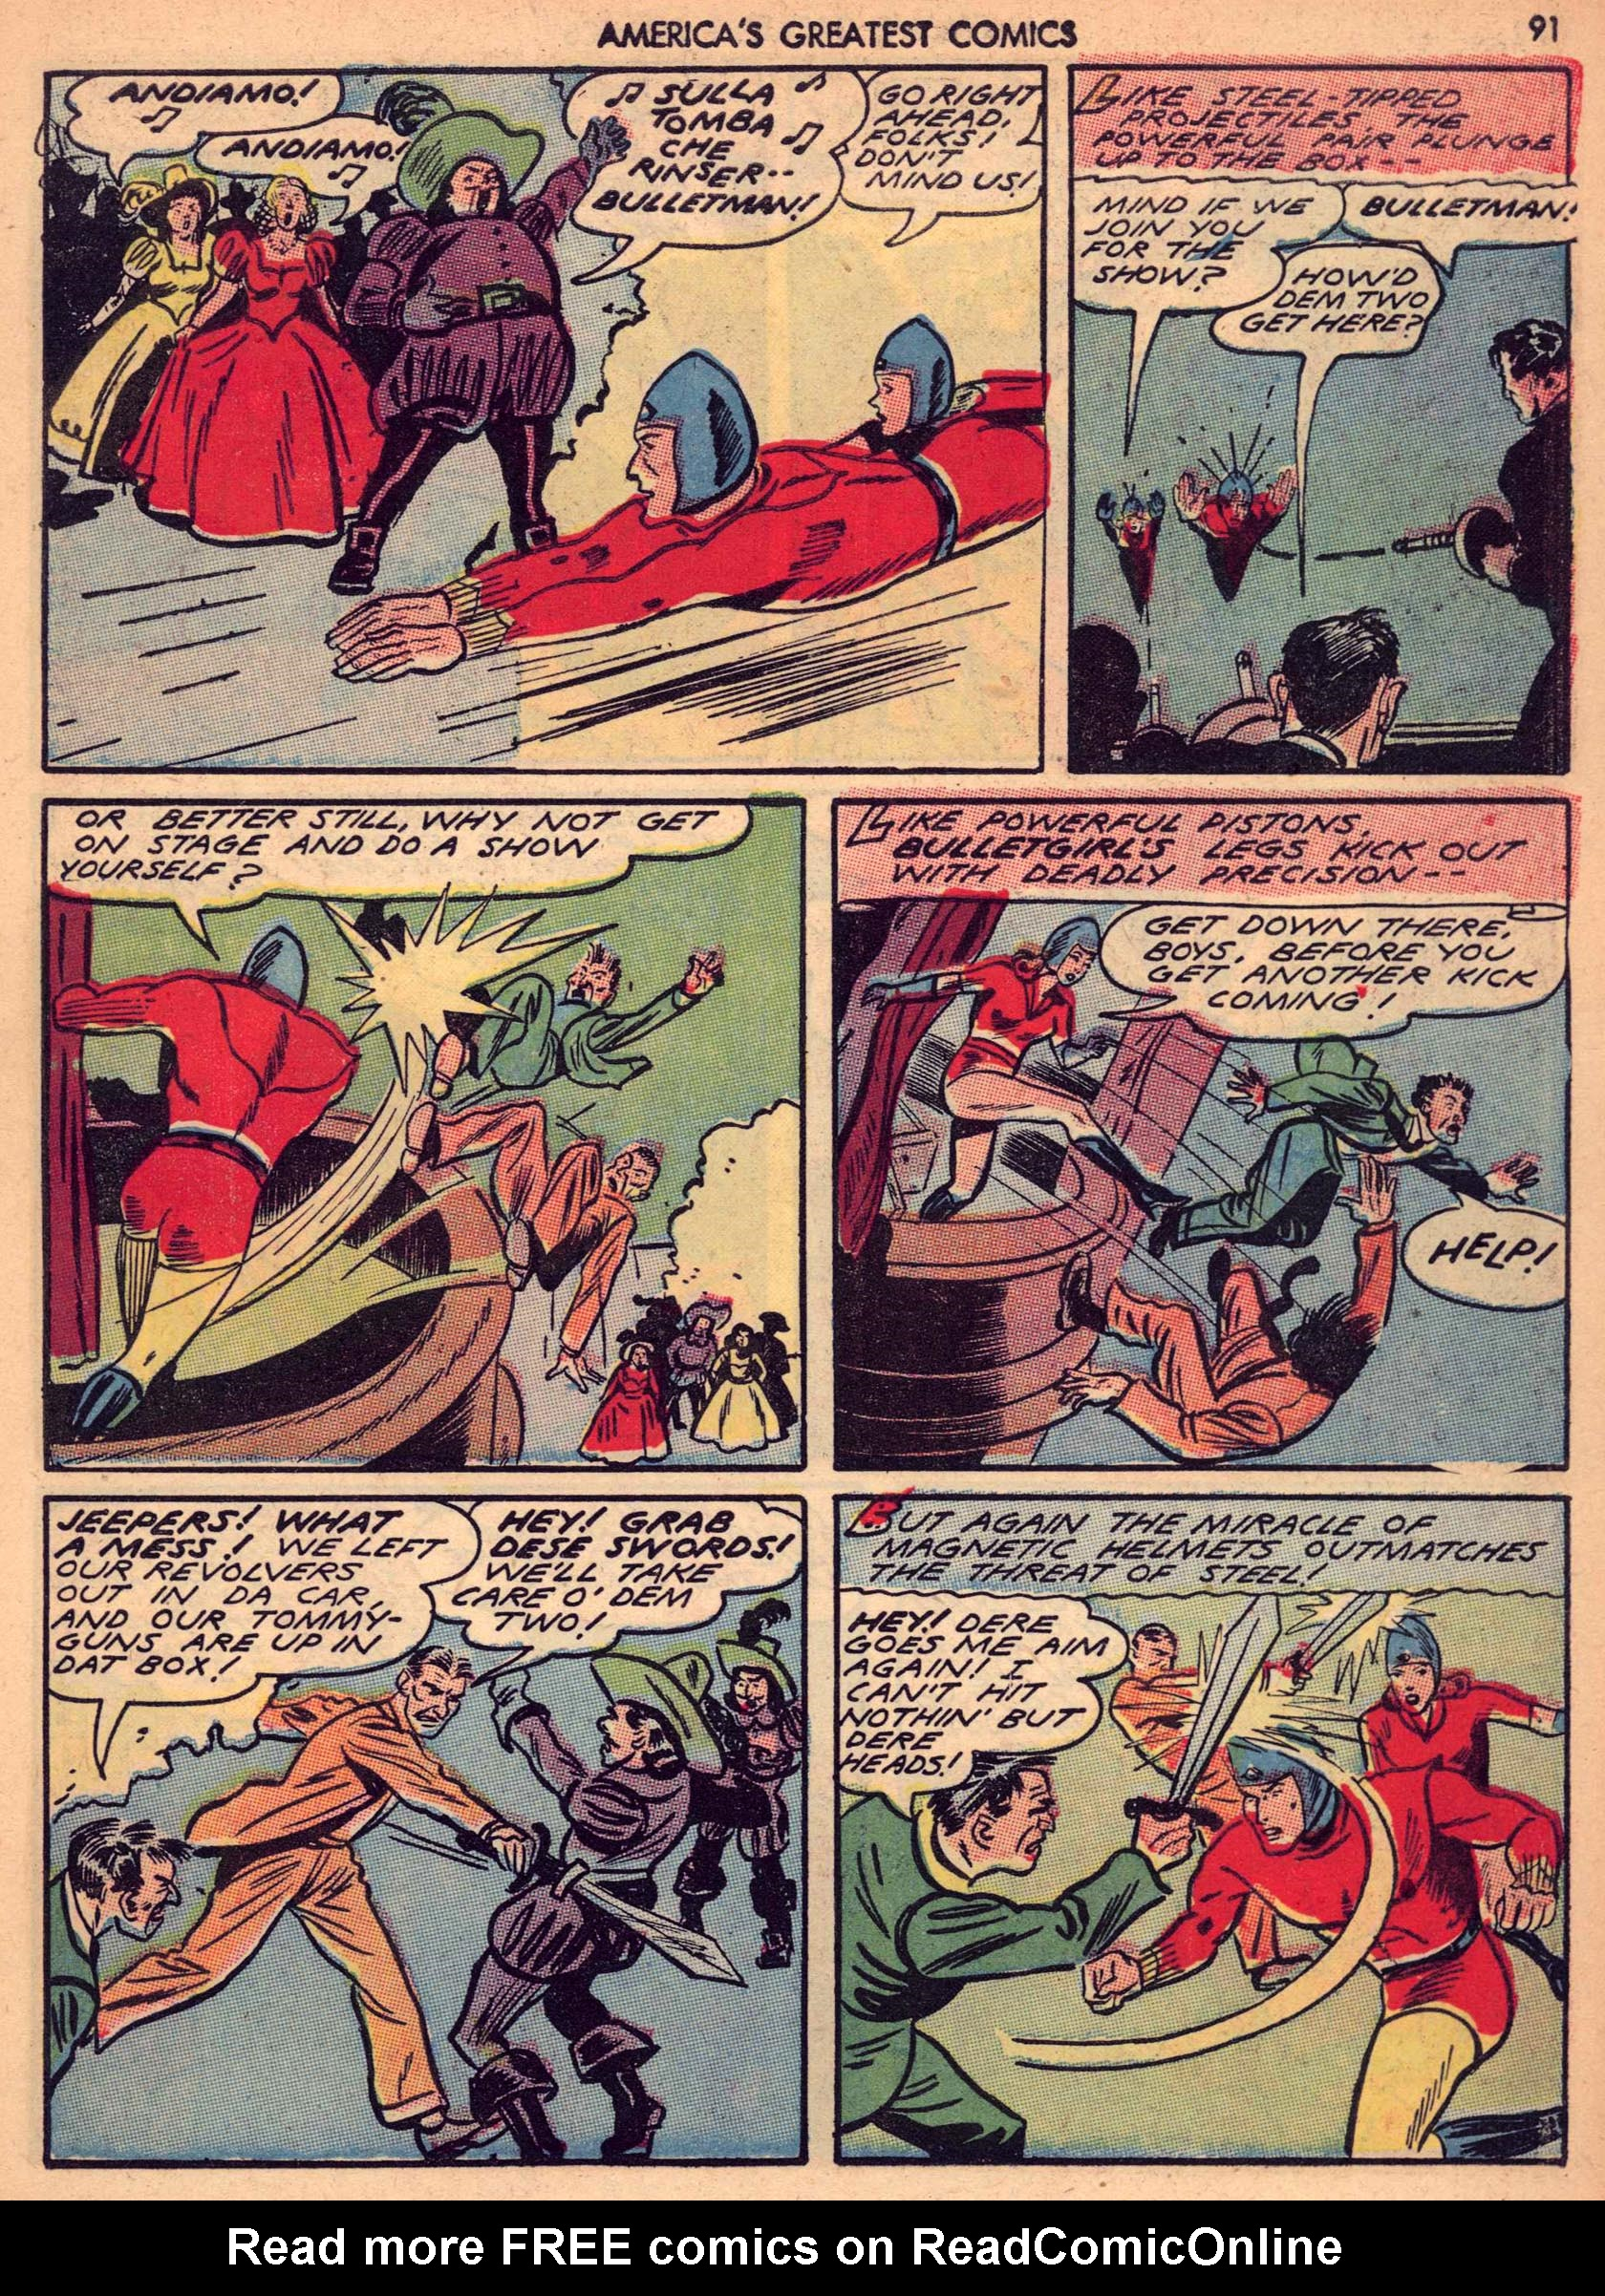 Read online America's Greatest Comics comic -  Issue #7 - 90